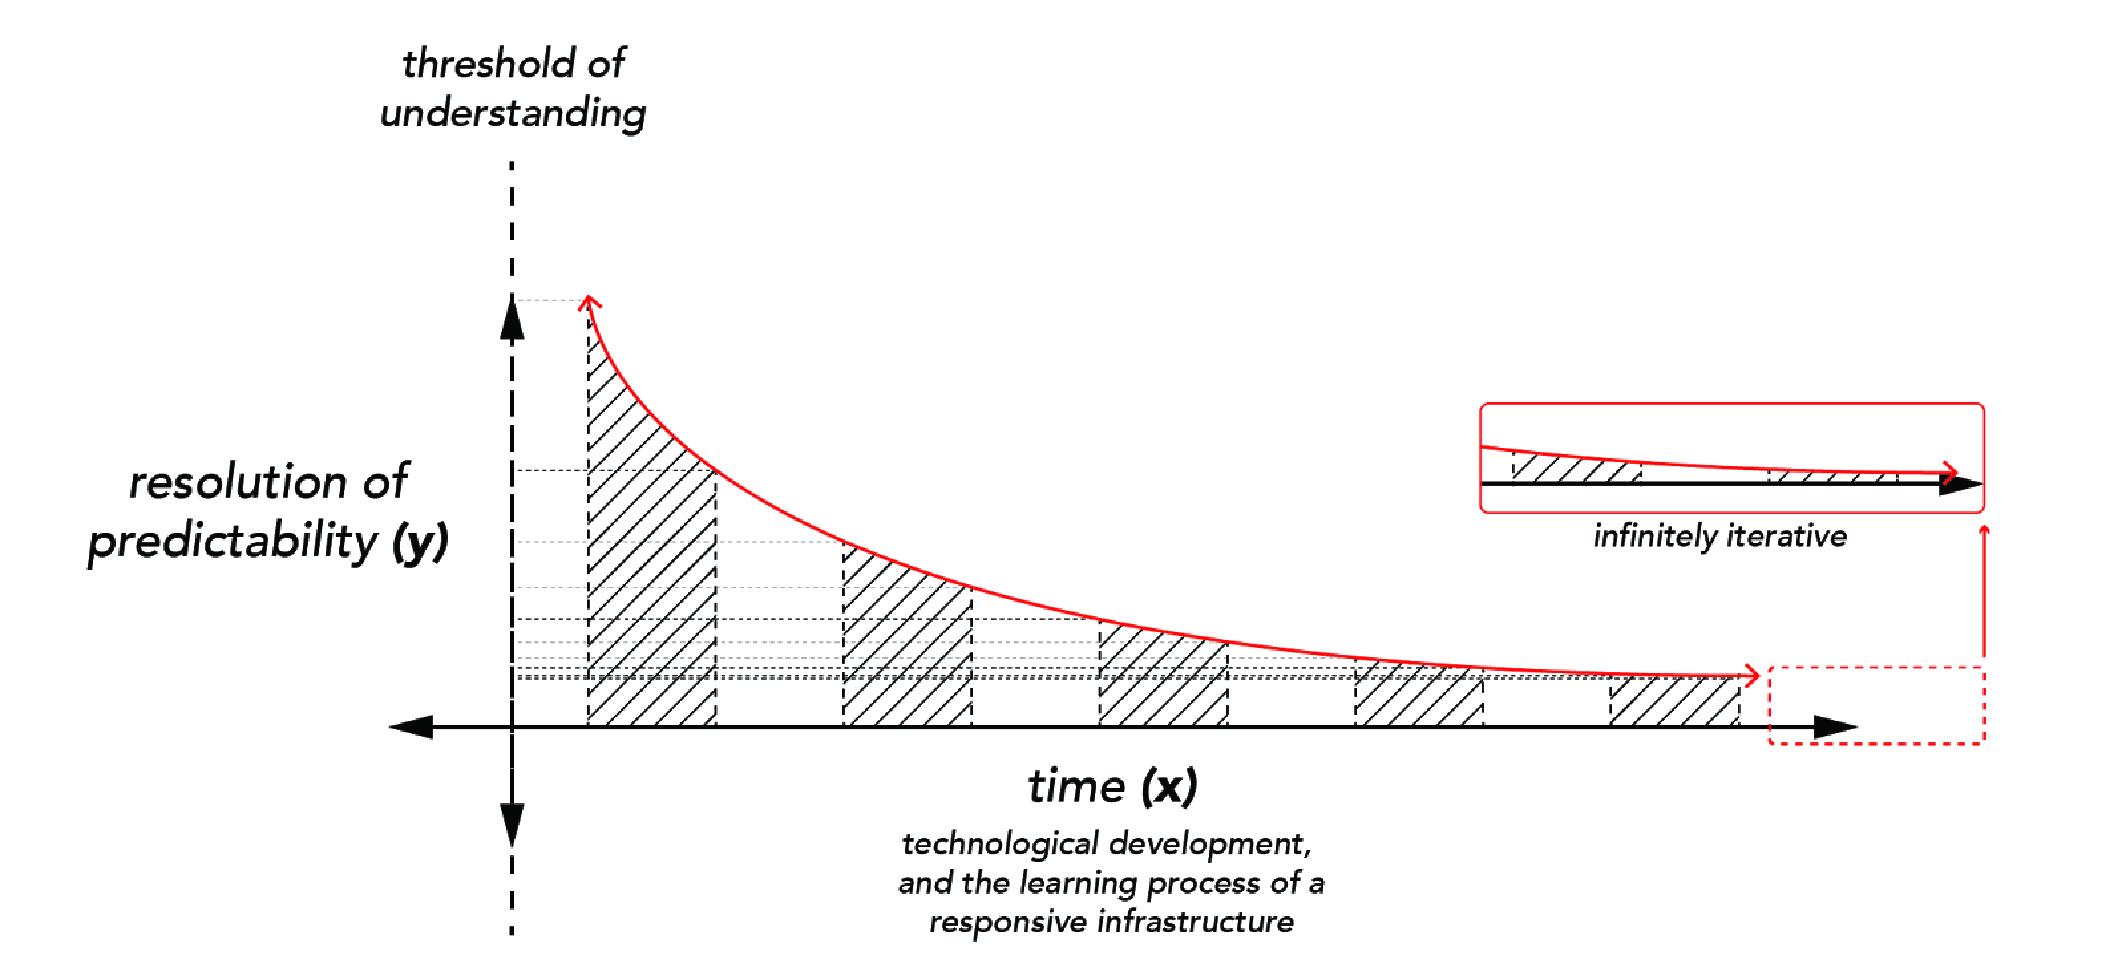 Leif Estrada, 2017, asymptote diagram, Responsive Environments and Artifacts Laboratory, Cambridge.